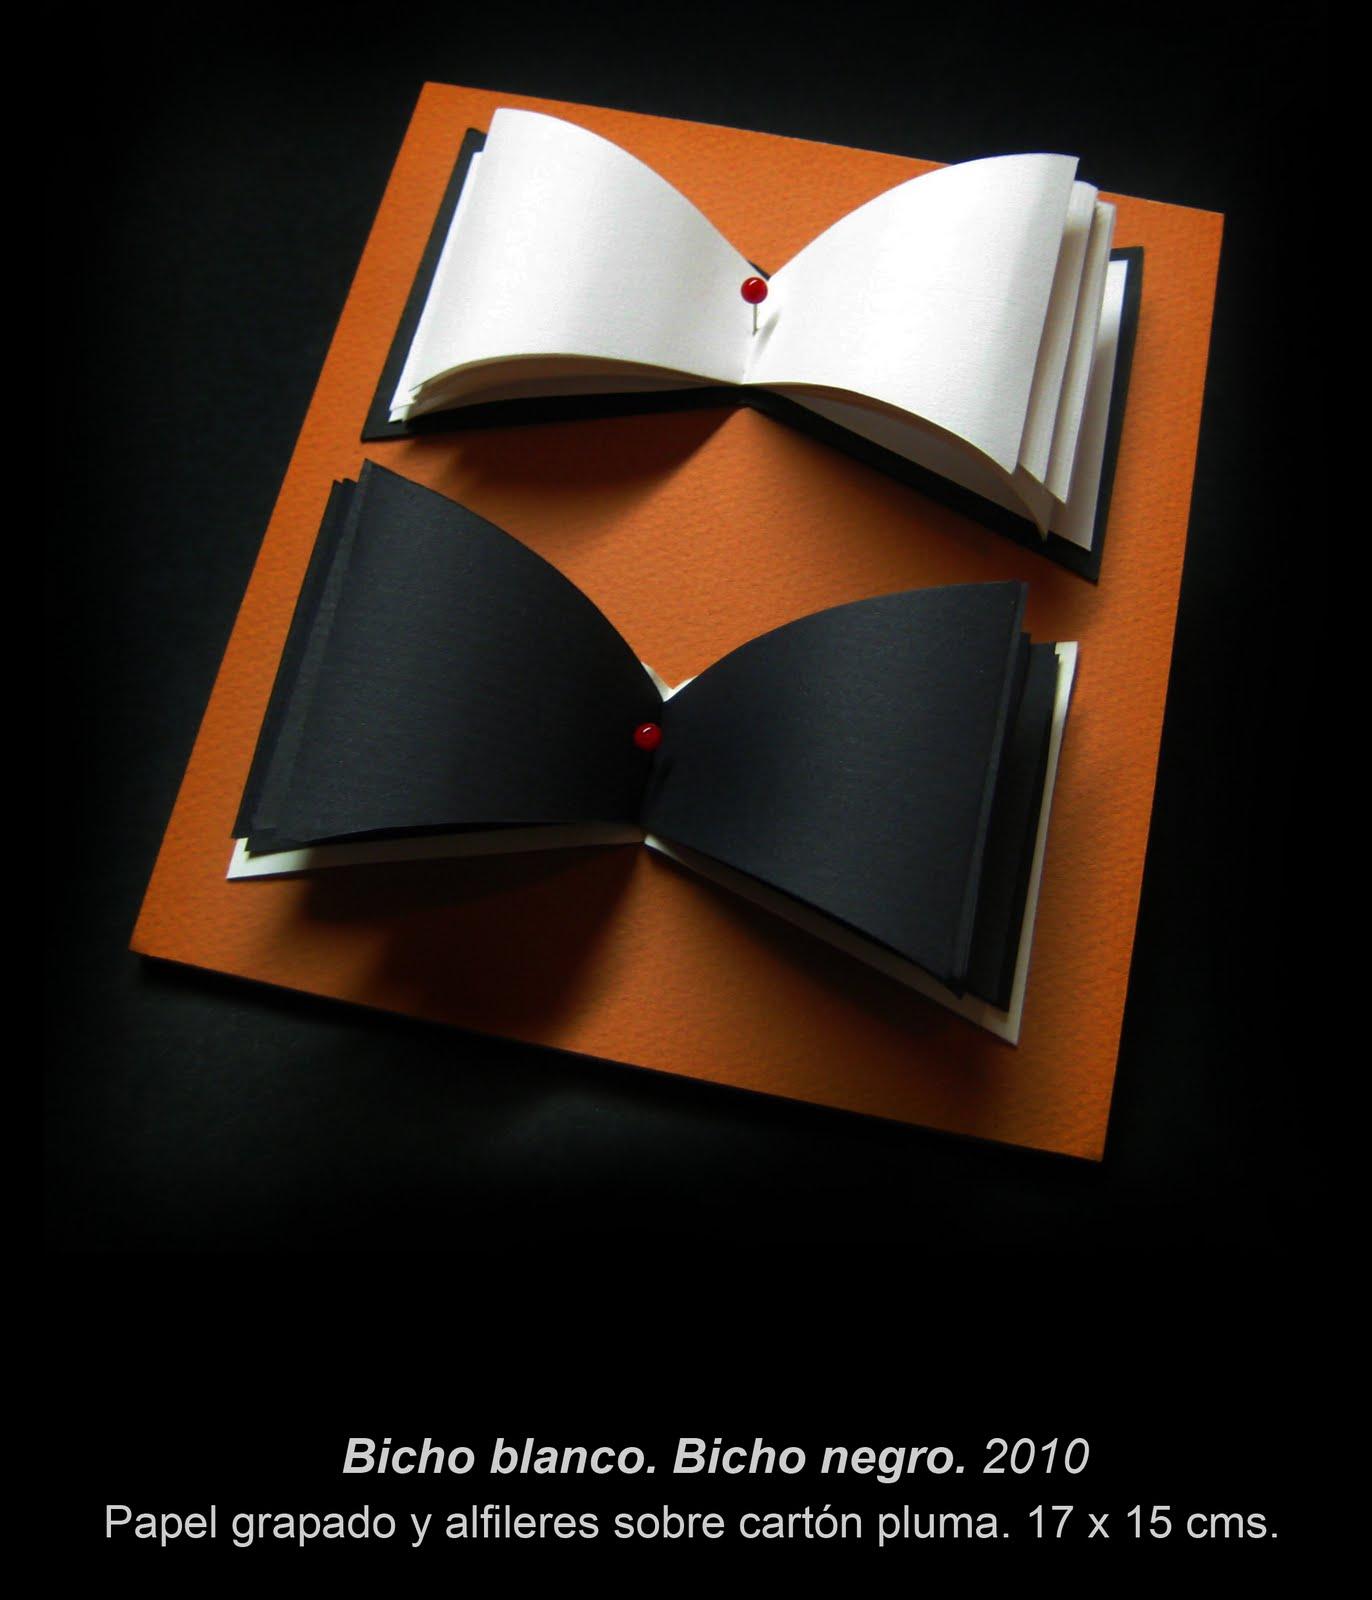 bicho blanco b negro